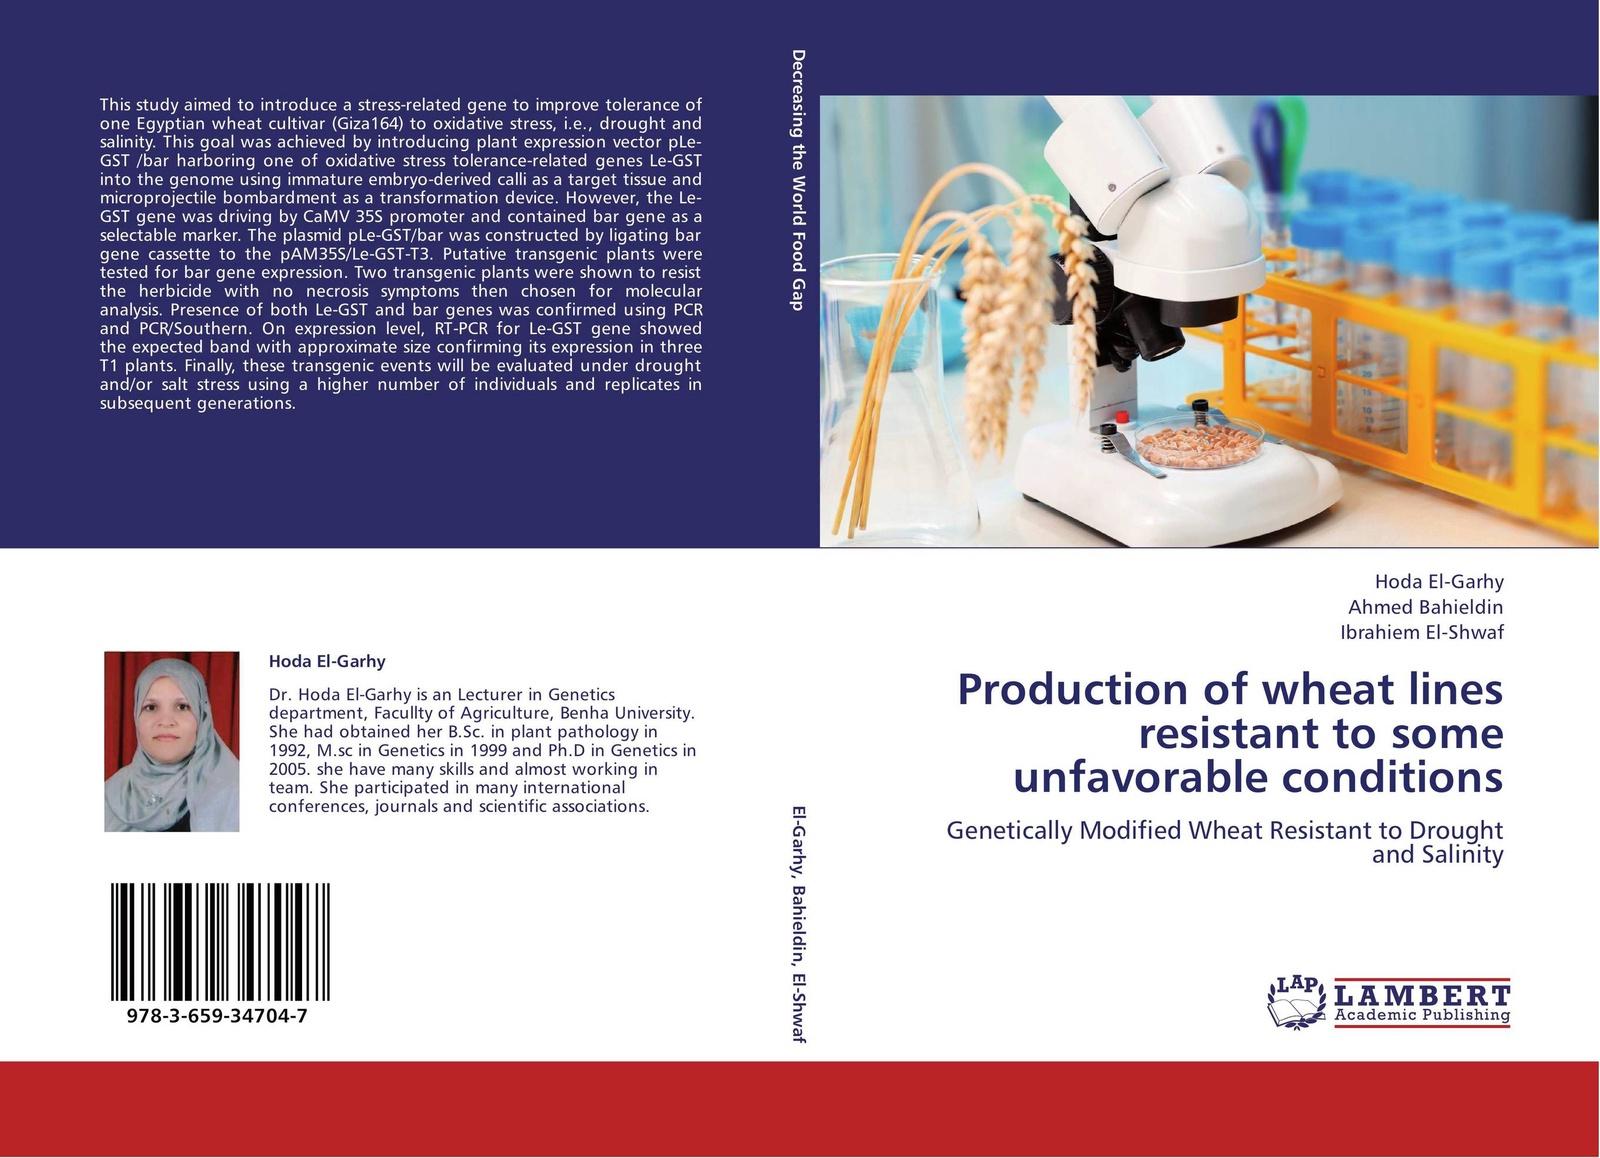 Hoda El-Garhy,Ahmed Bahieldin and Ibrahiem El-Shwaf Production of wheat lines resistant to some unfavorable conditions недорго, оригинальная цена